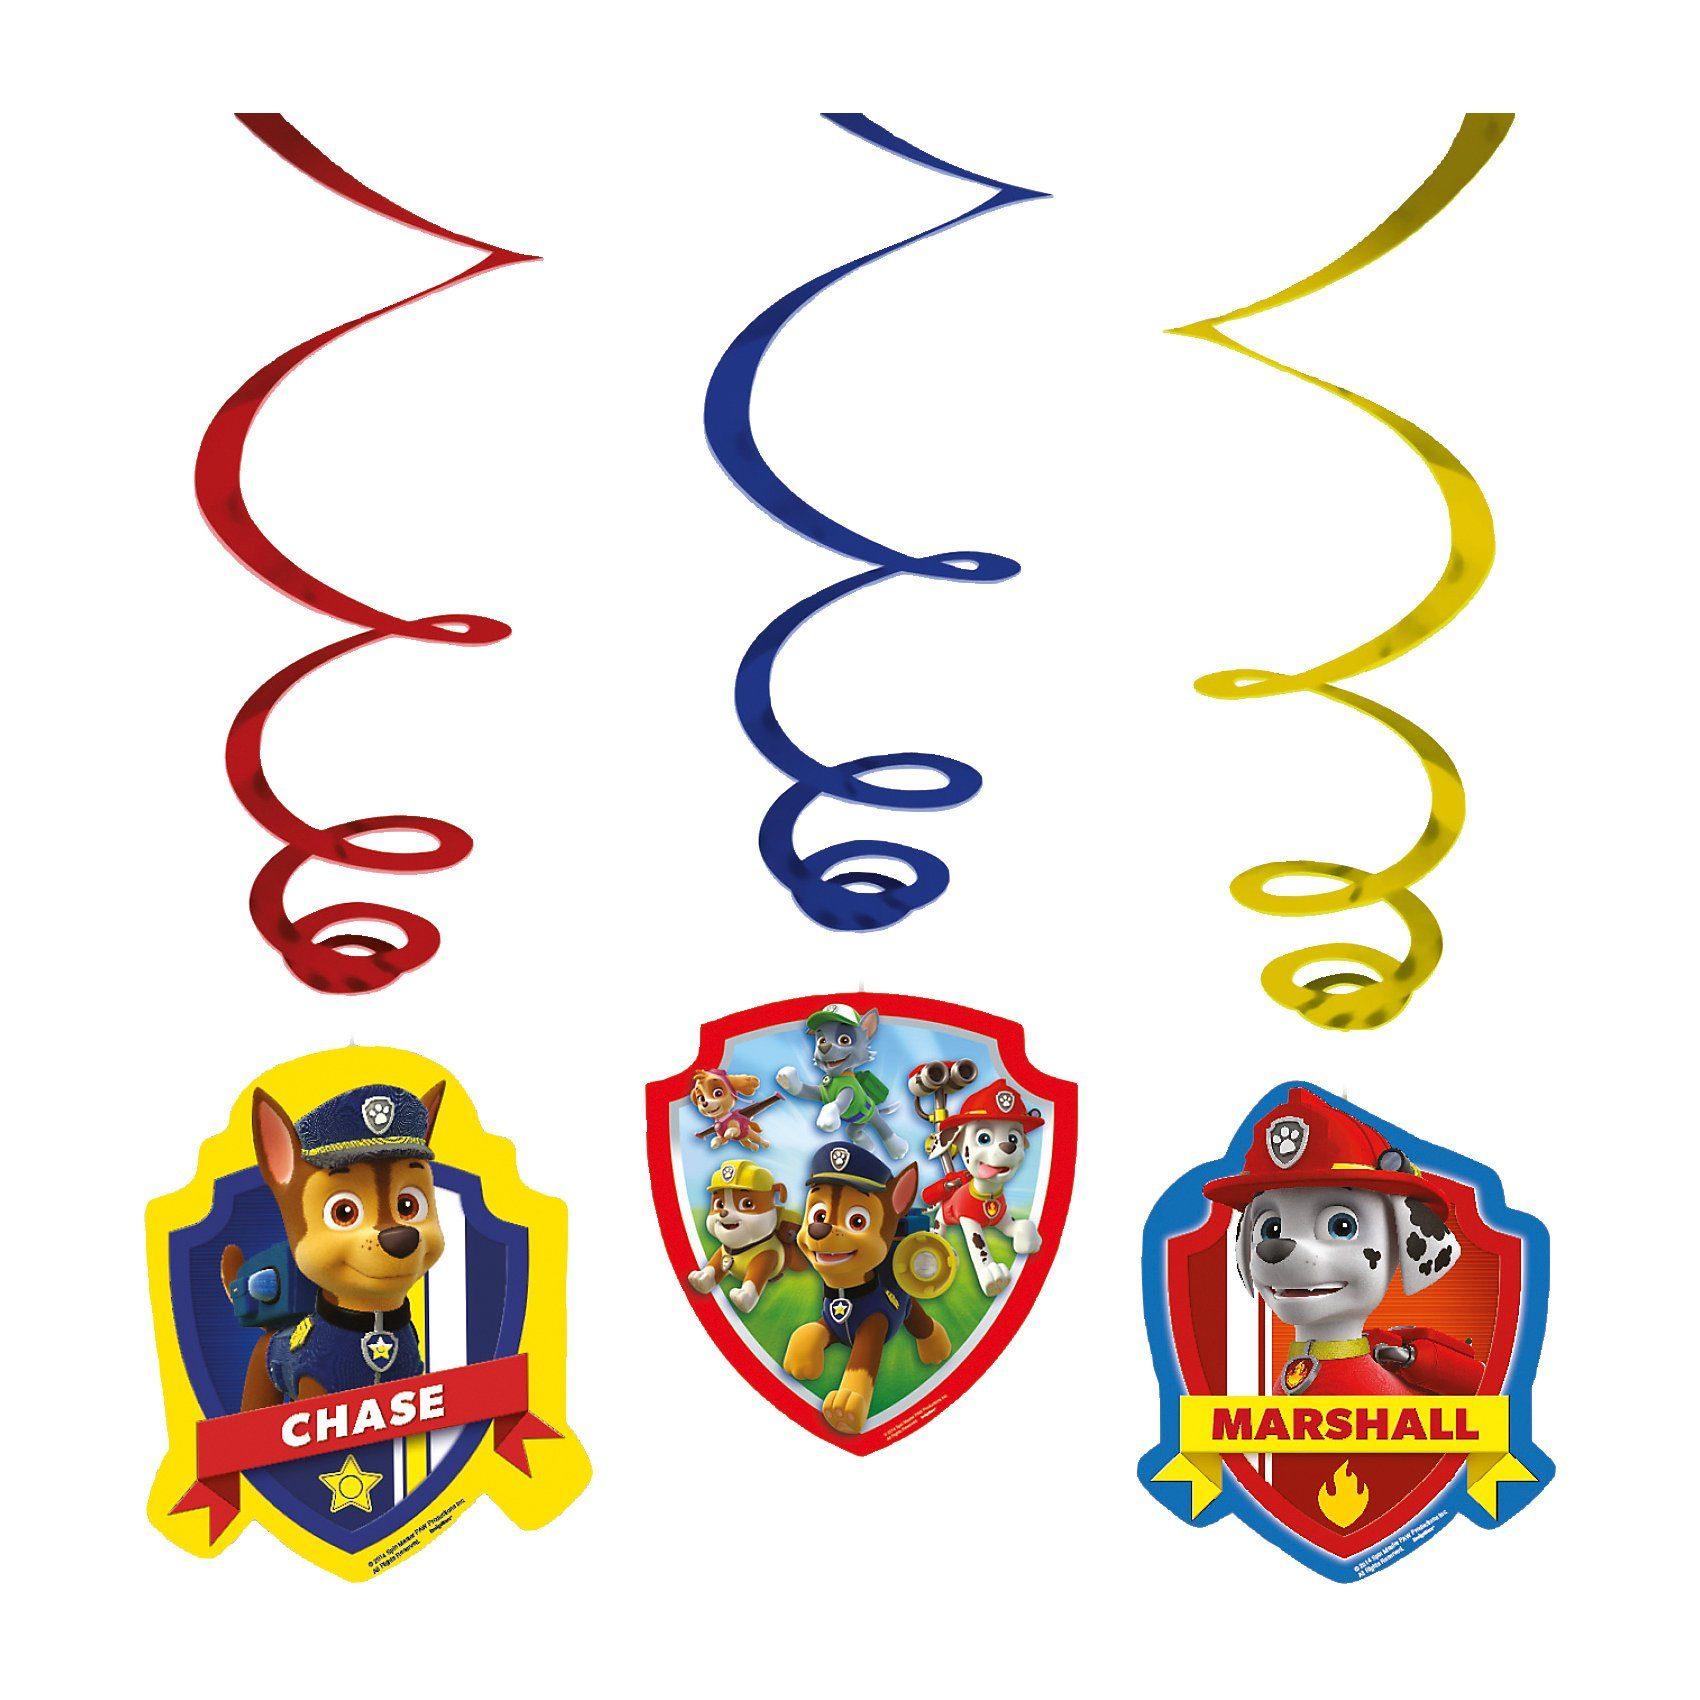 Amscan Deko-Spiralen Paw Patrol, 6 Stück